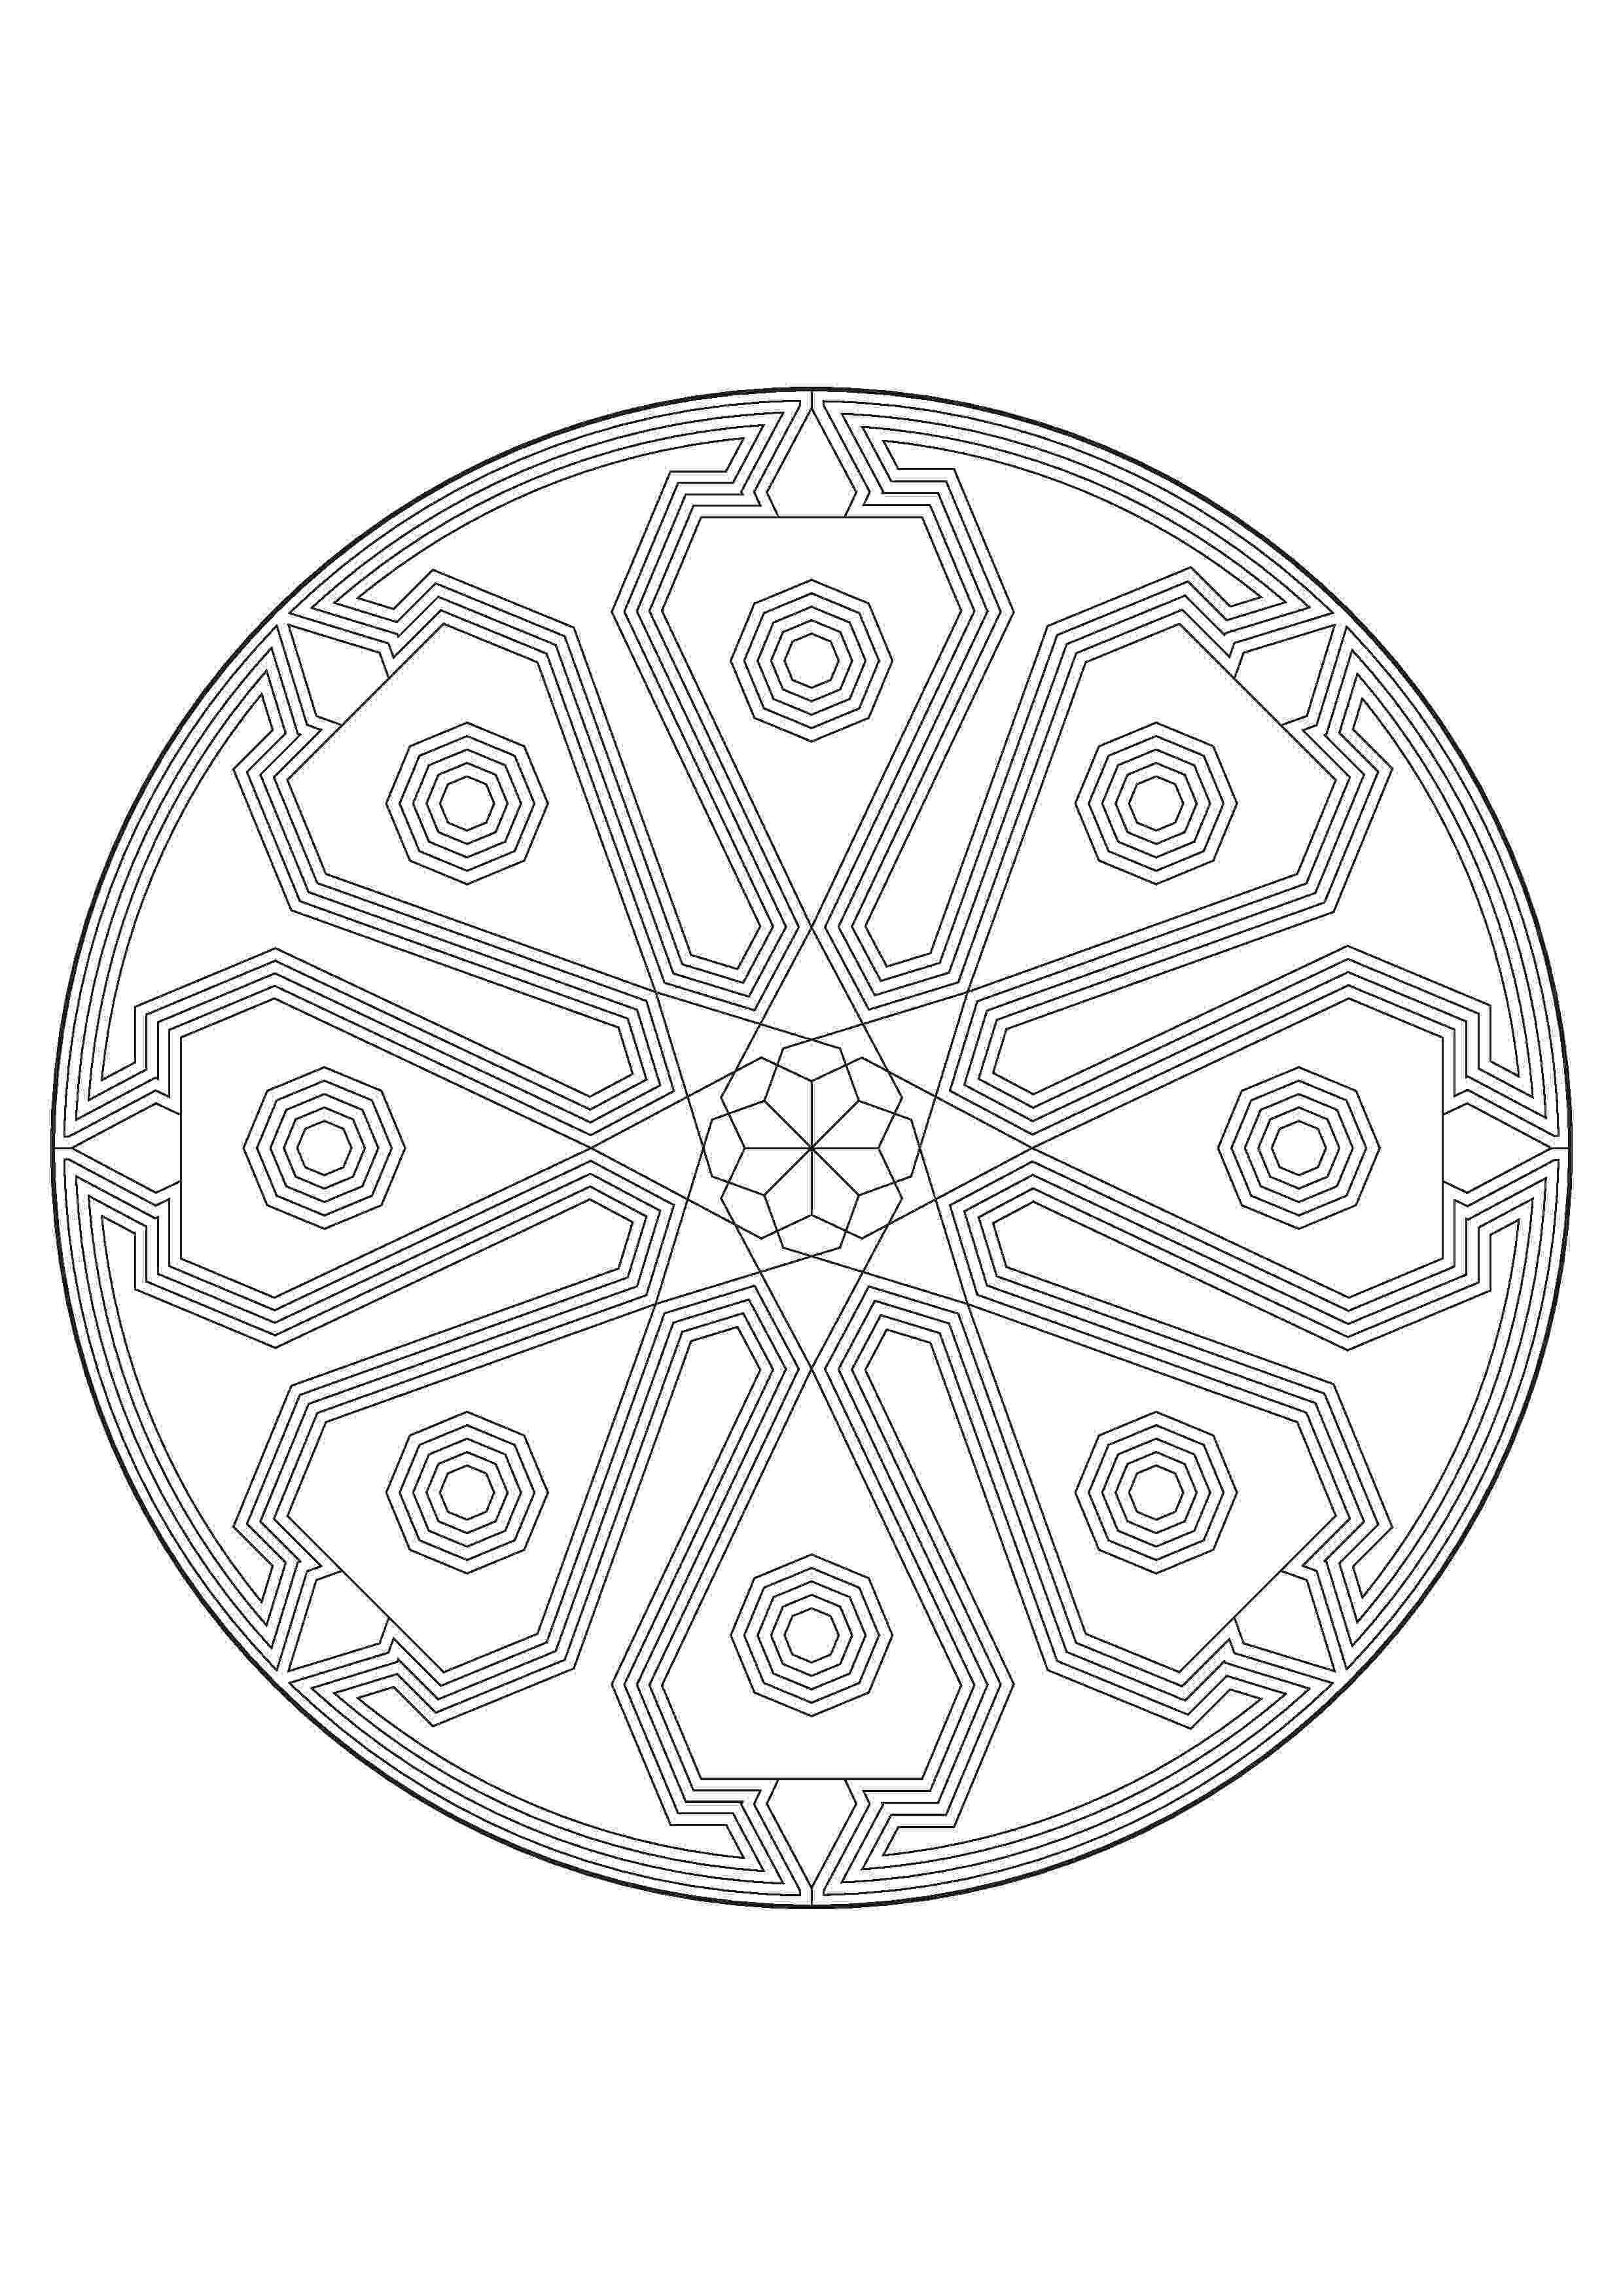 free mandalas to print flower mandala coloring pages best coloring pages for kids free to print mandalas